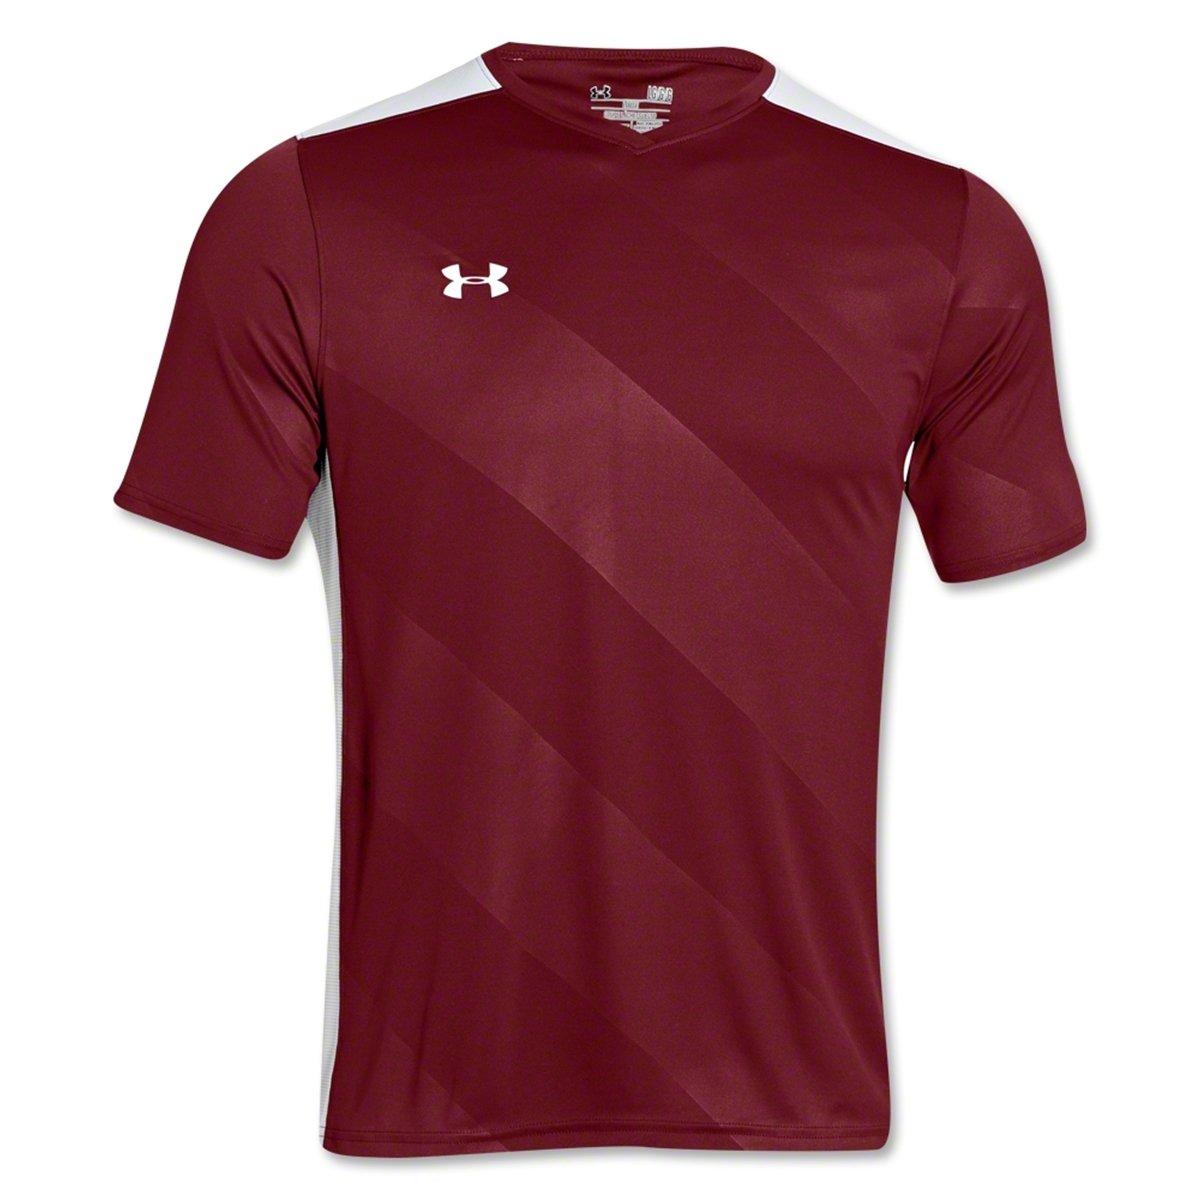 ddc2fb2108e Amazon.com  Under Armour Men s Fixture Soccer Jersey  Clothing